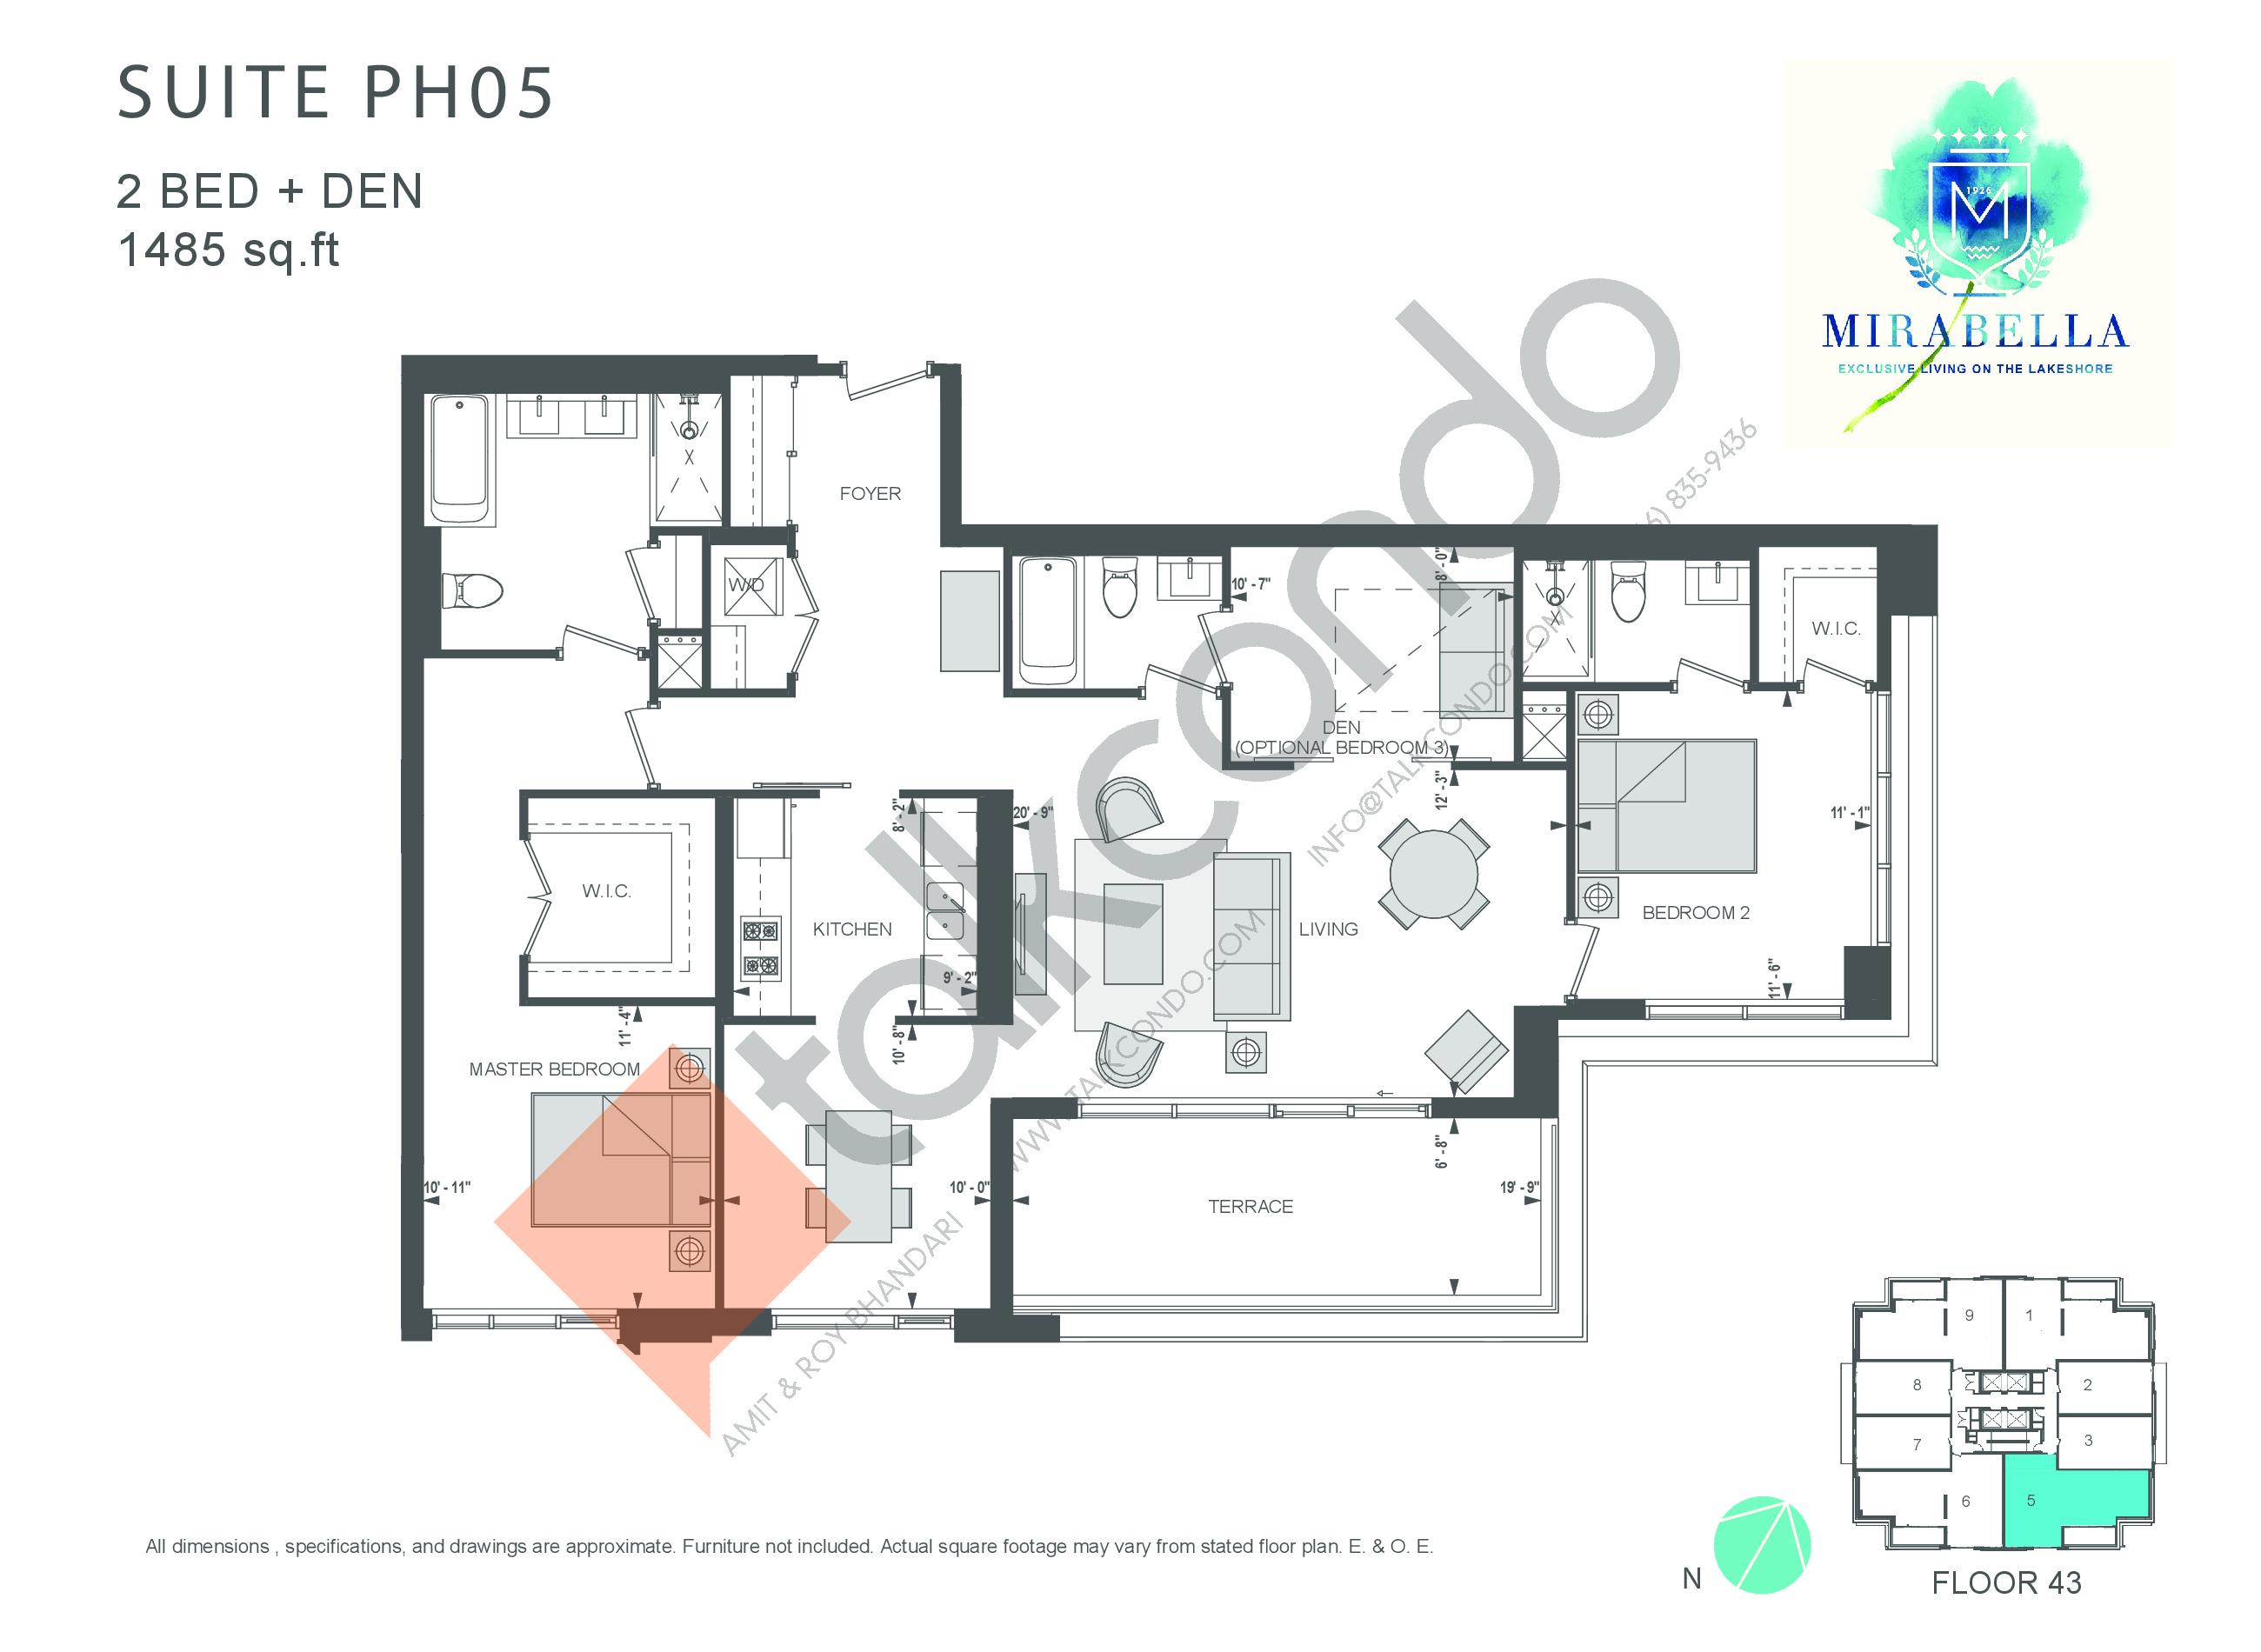 Suite PH05 Floor Plan at Mirabella Luxury Condos East Tower - 1485 sq.ft